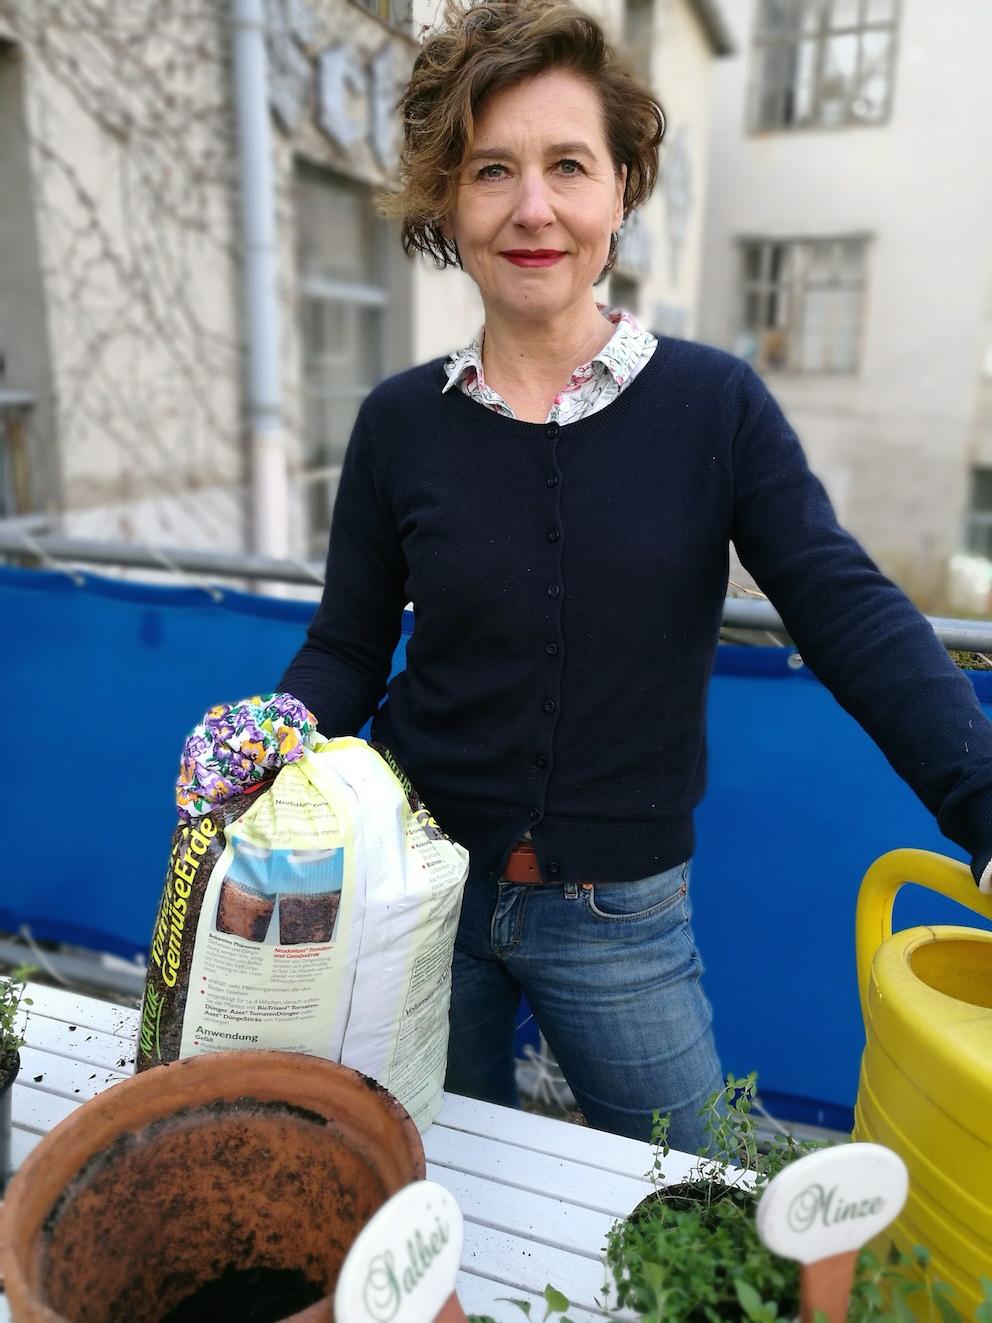 Überländerin Barbara Kanzian im Porträt